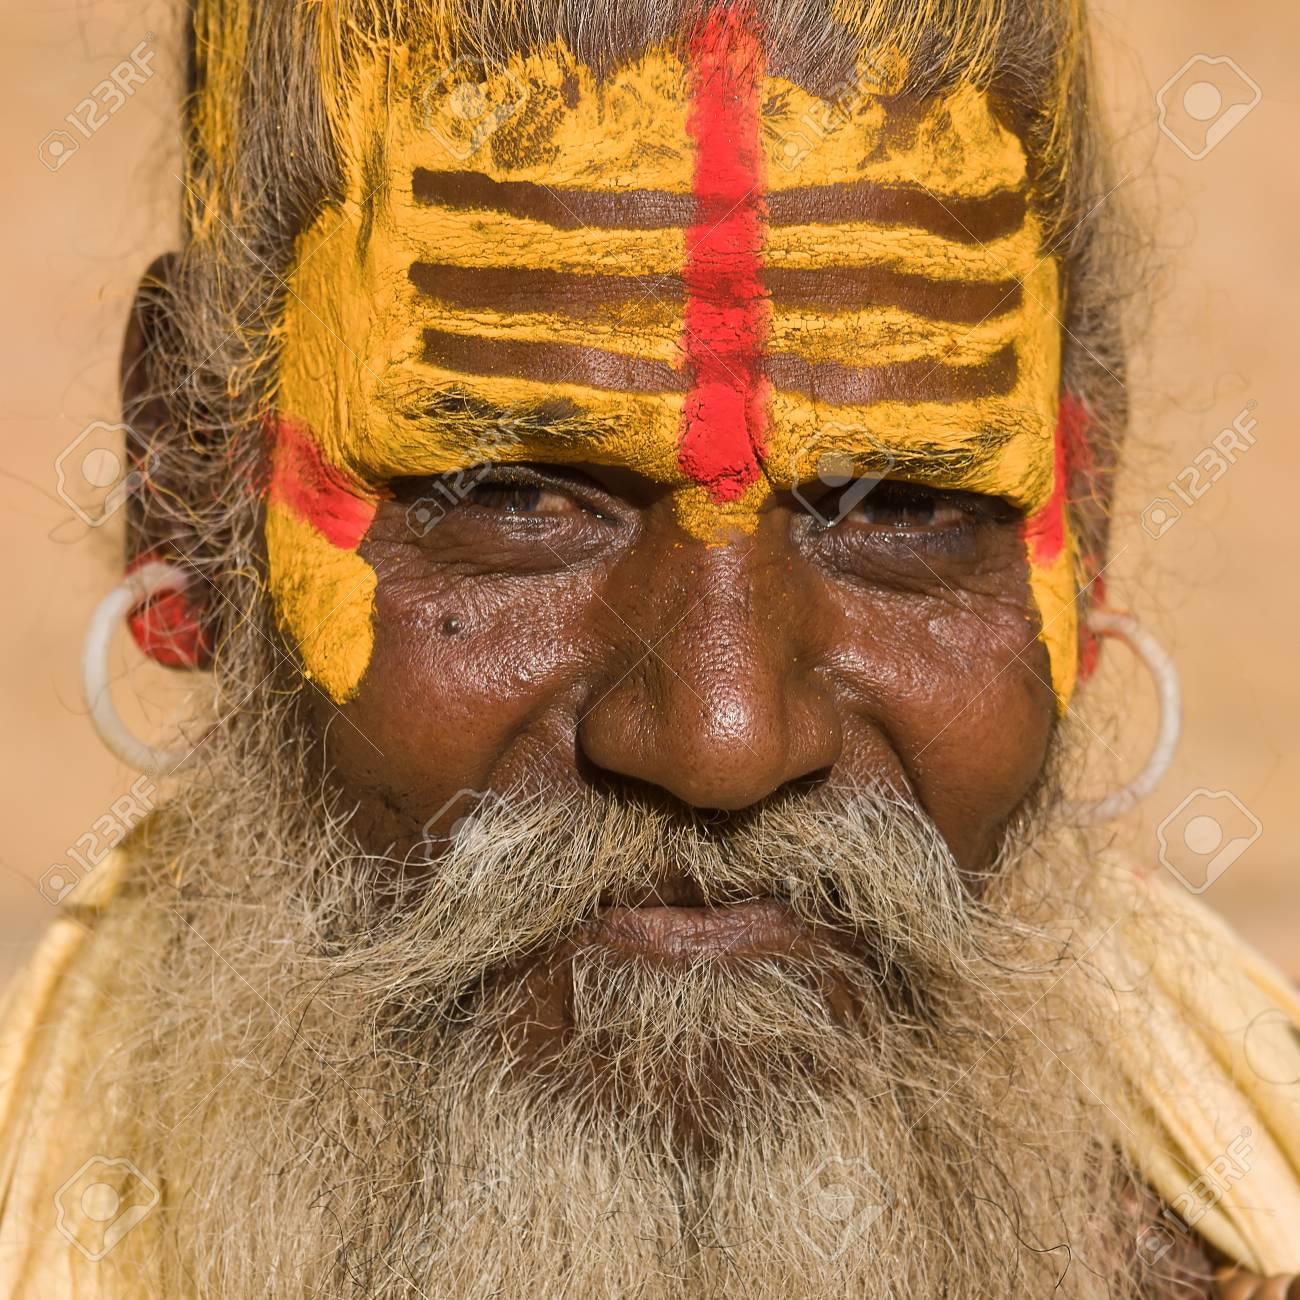 Indian sadhu (holy man) Stock Photo - 19750825